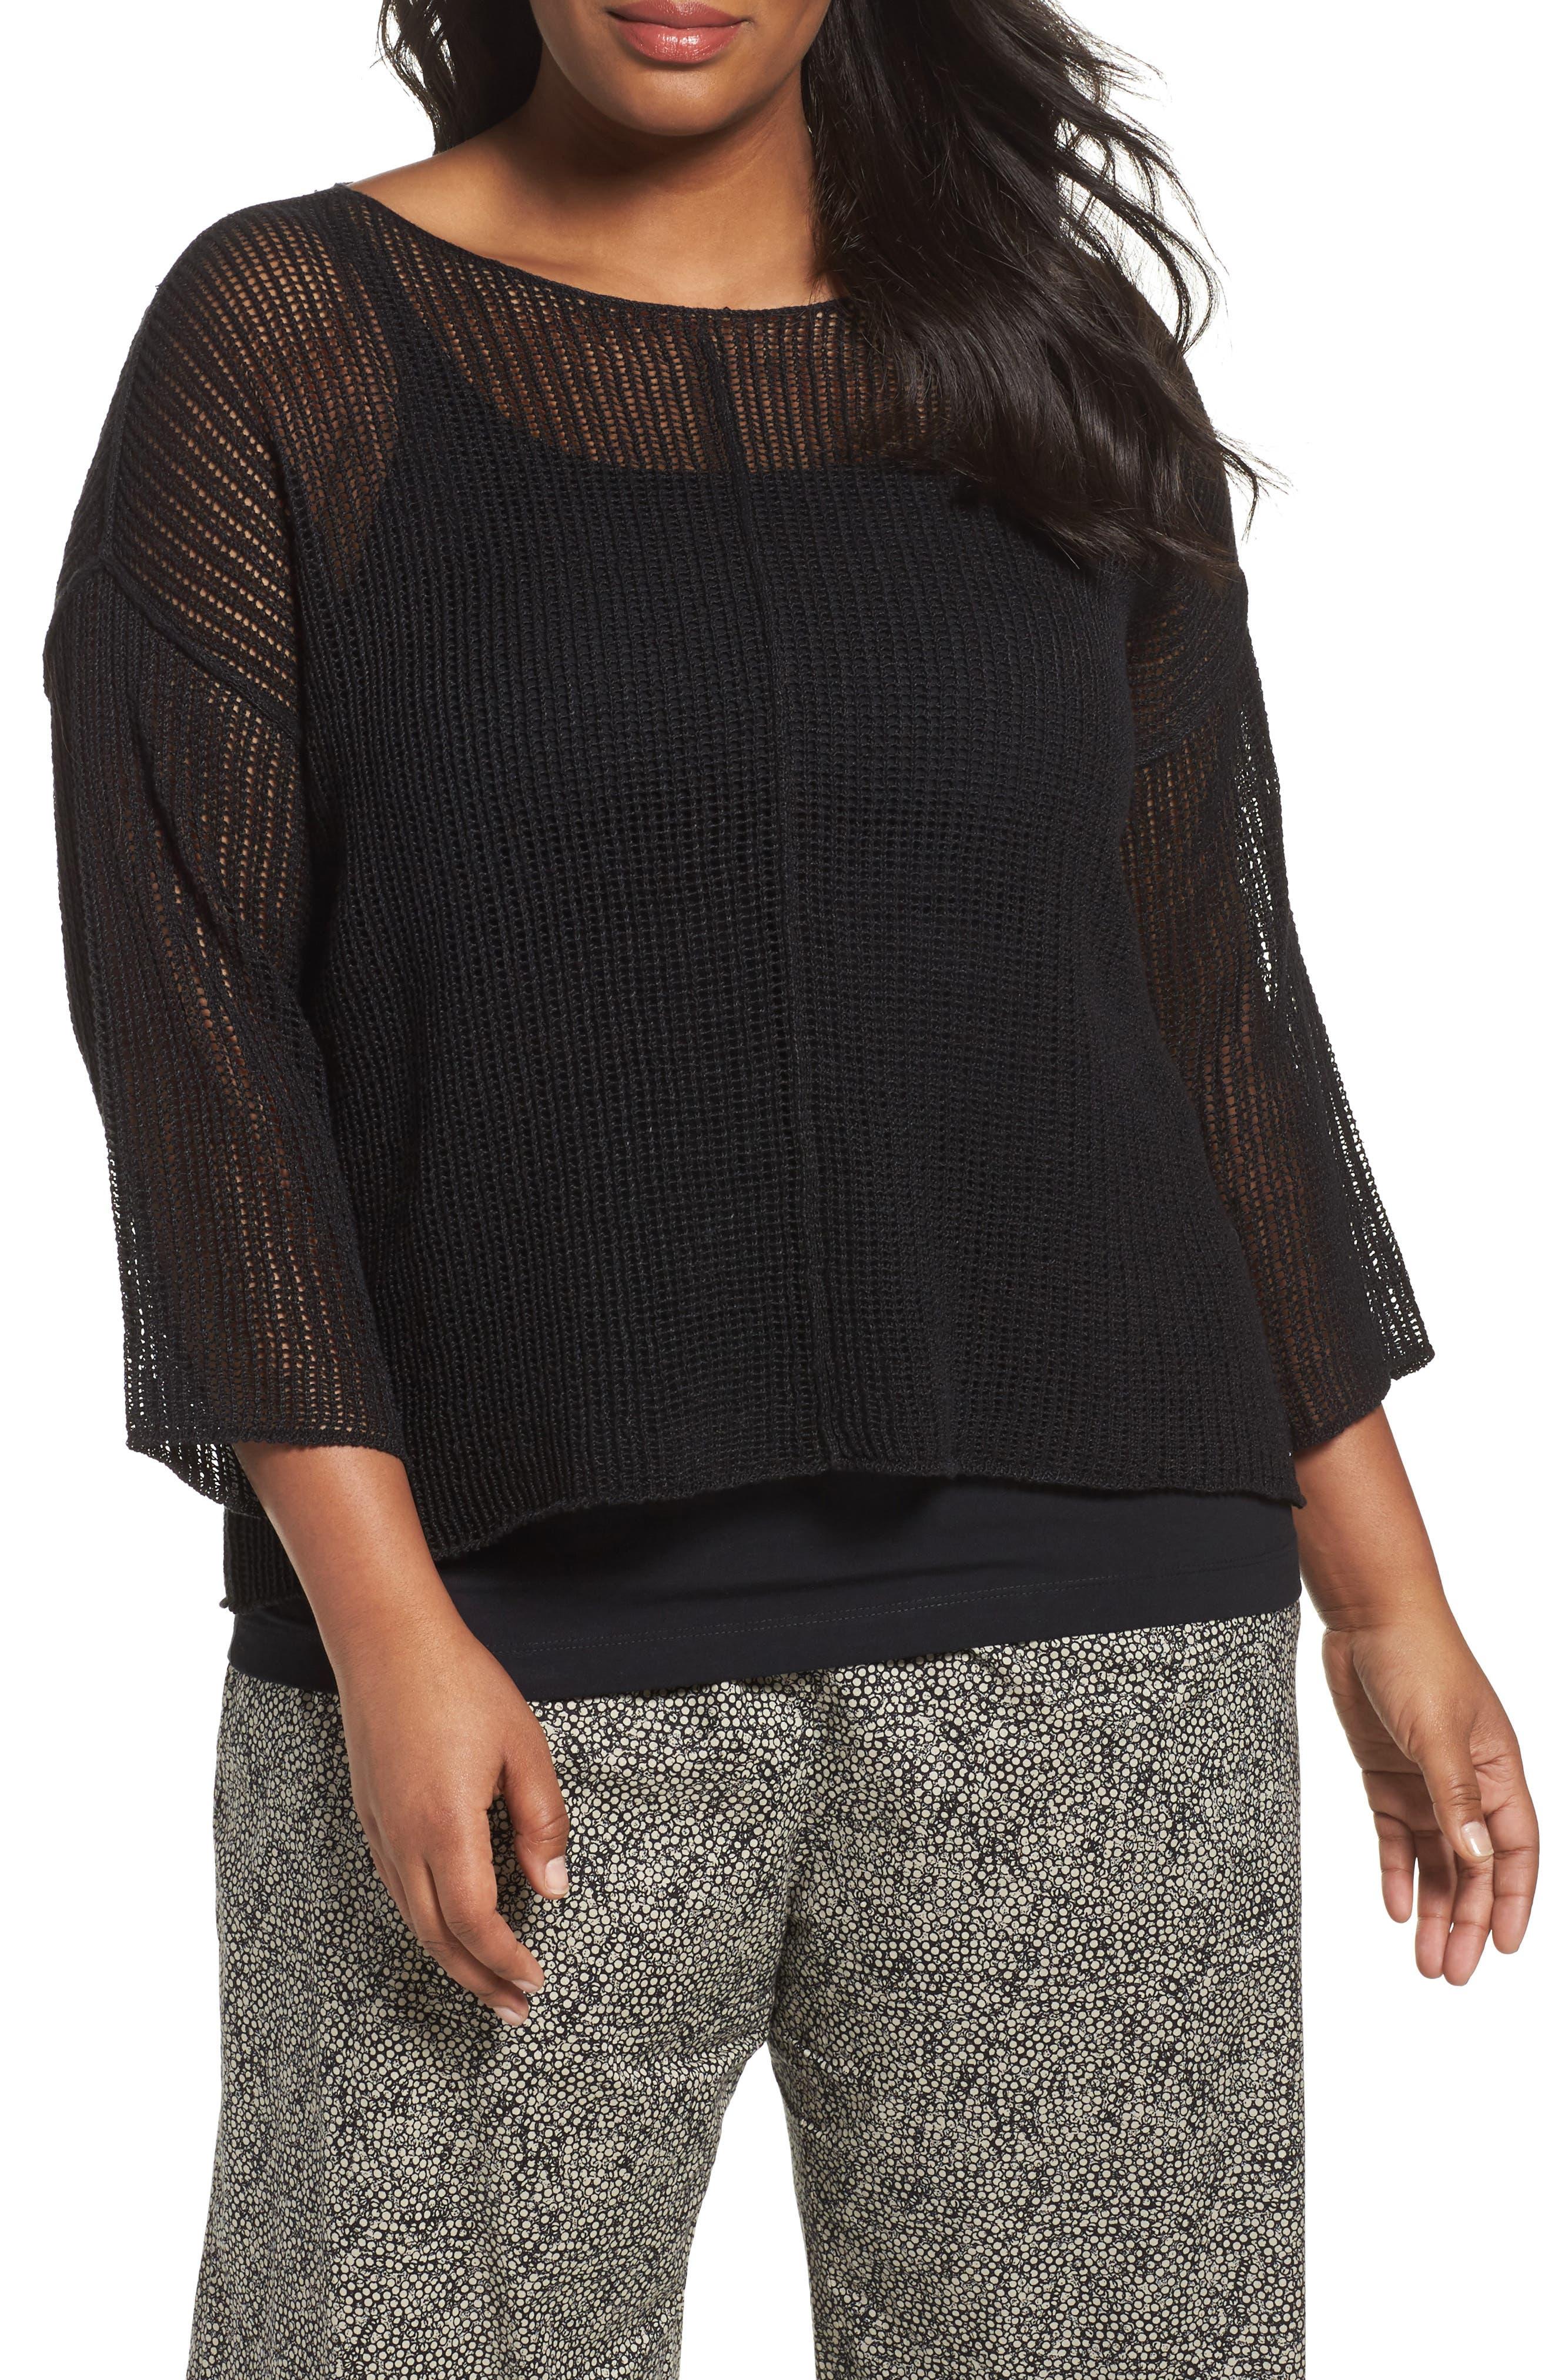 Main Image - Eileen Fisher Organic Linen Mesh Knit Top (Plus Size)